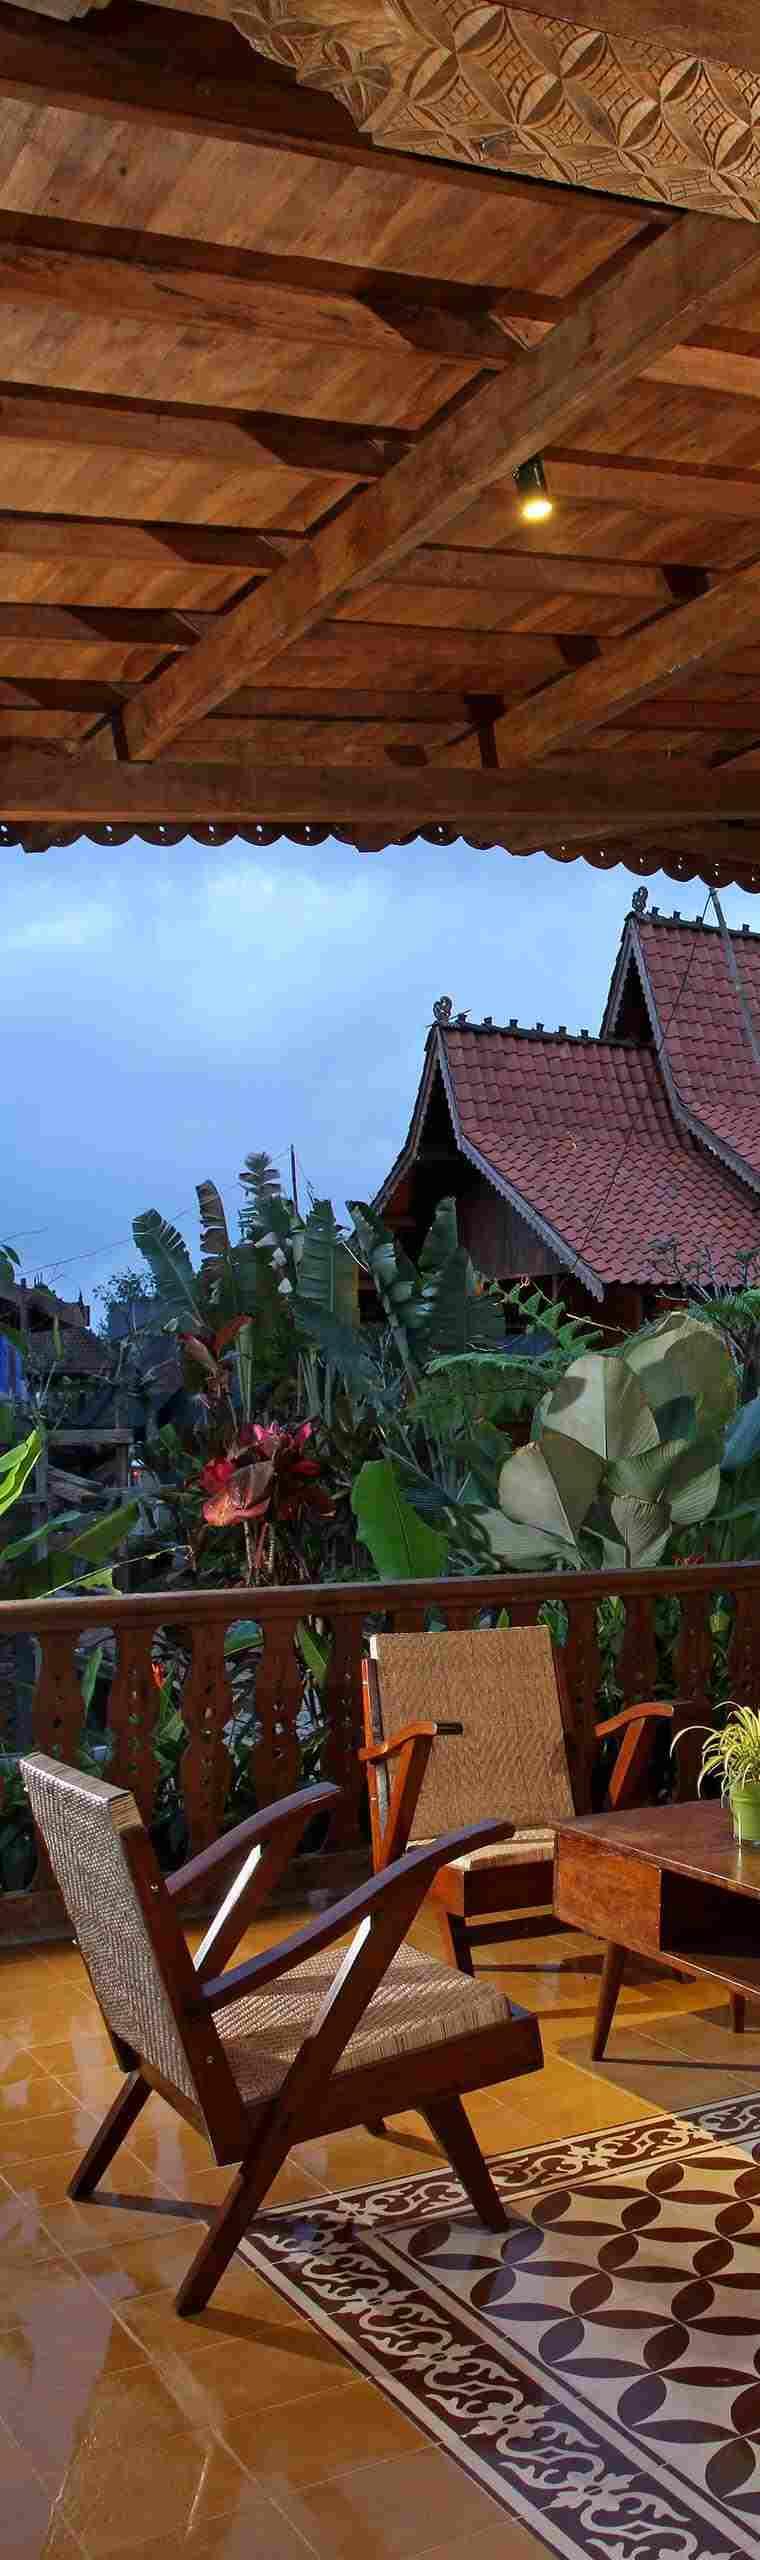 cubierta terraza madera tallada